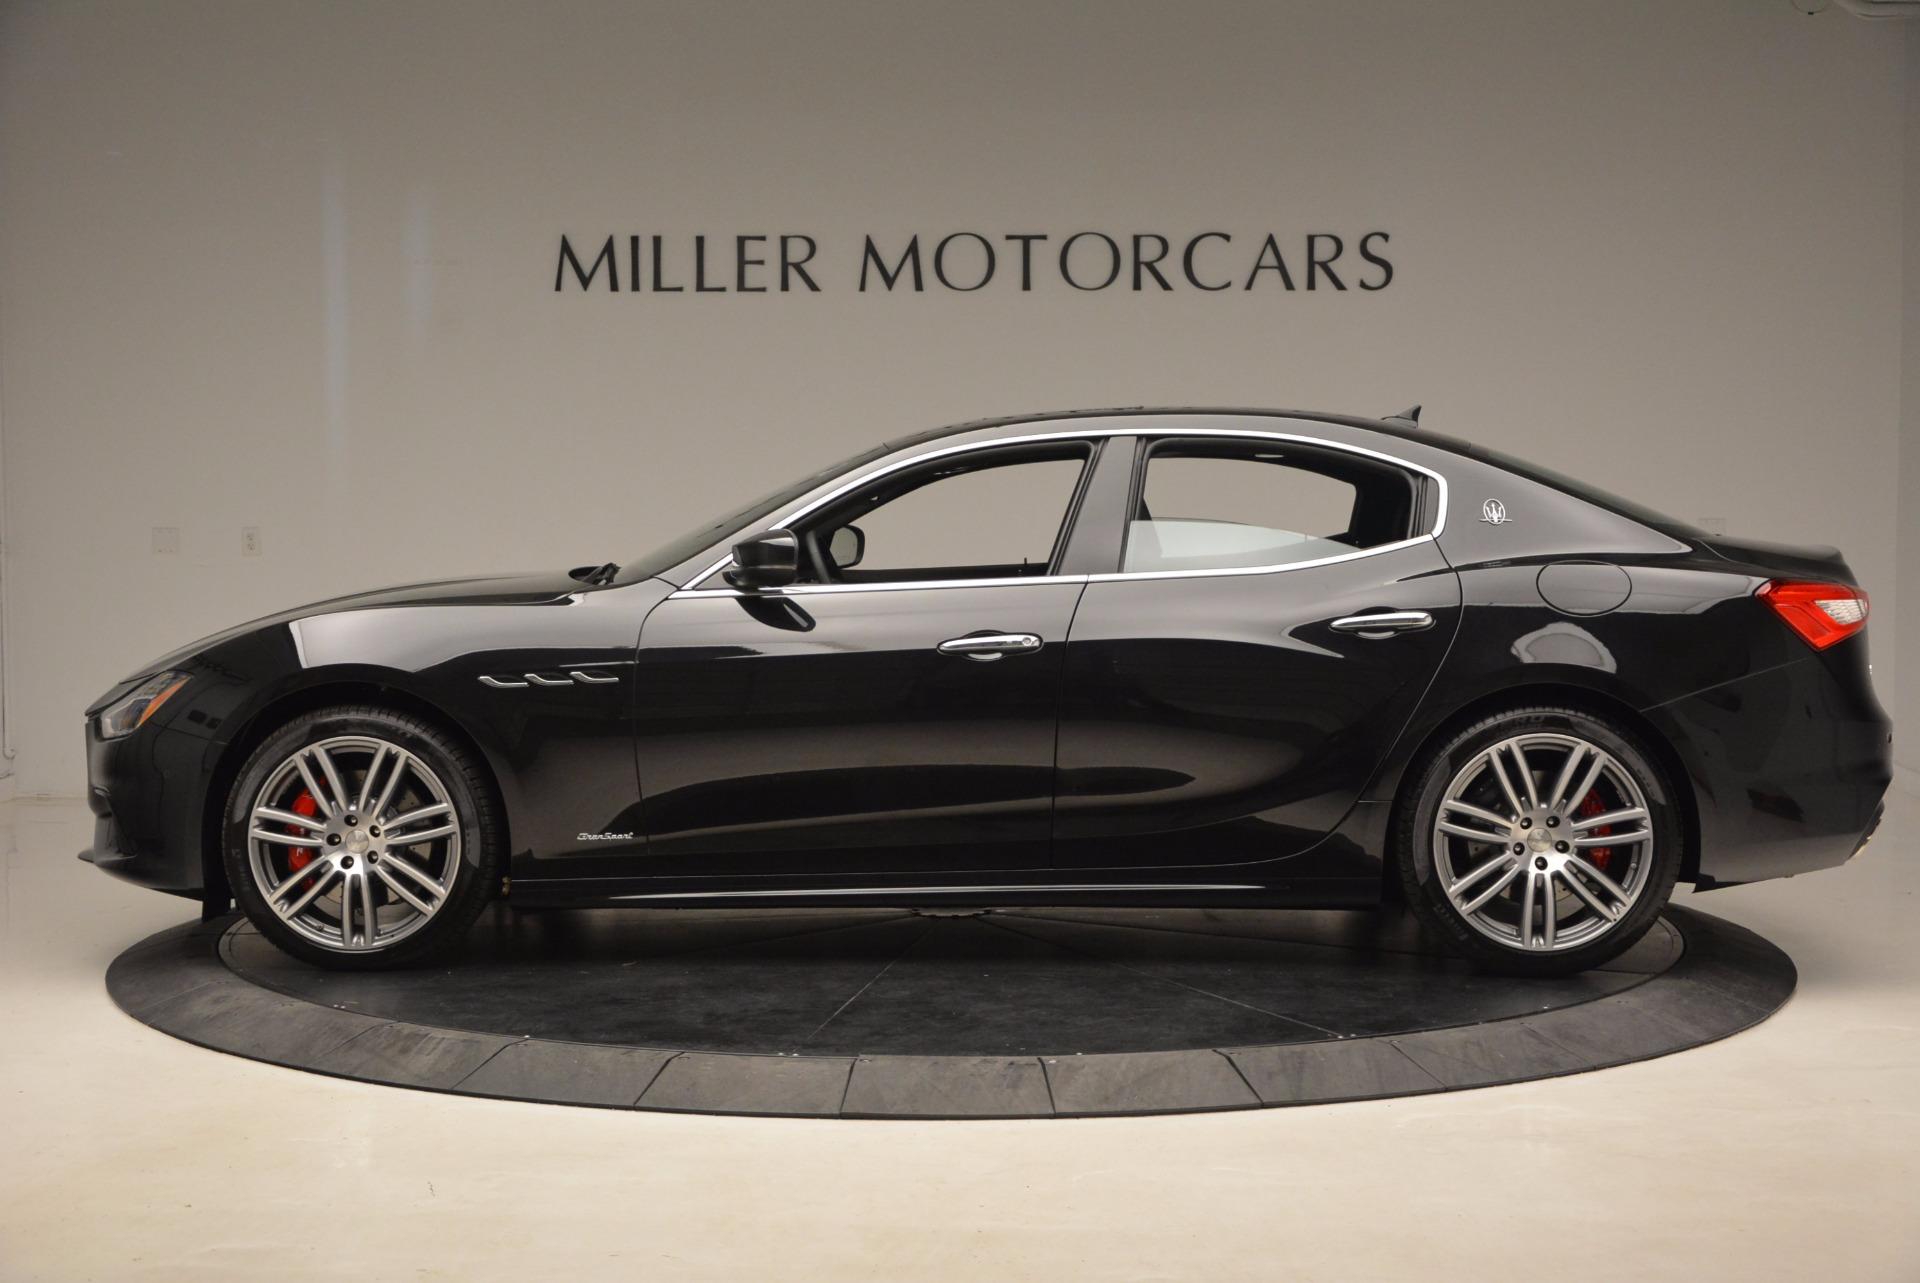 New 2018 Maserati Ghibli S Q4 GranSport For Sale In Greenwich, CT 1541_p3